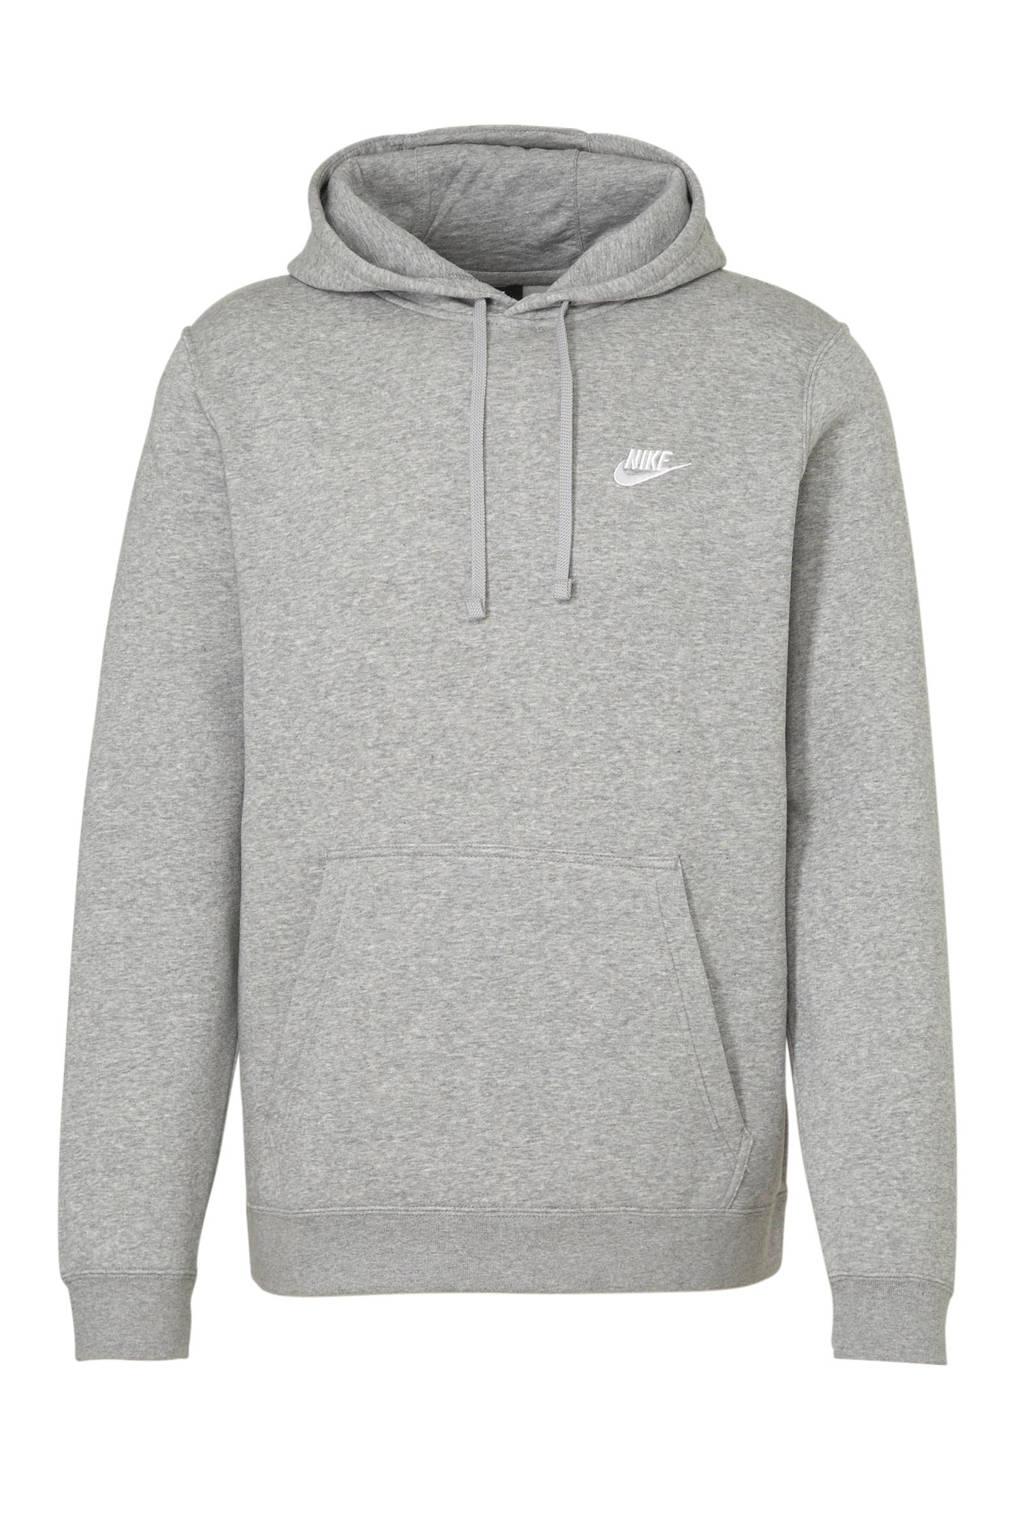 Nike   hoody grijs melange, Grijs melange